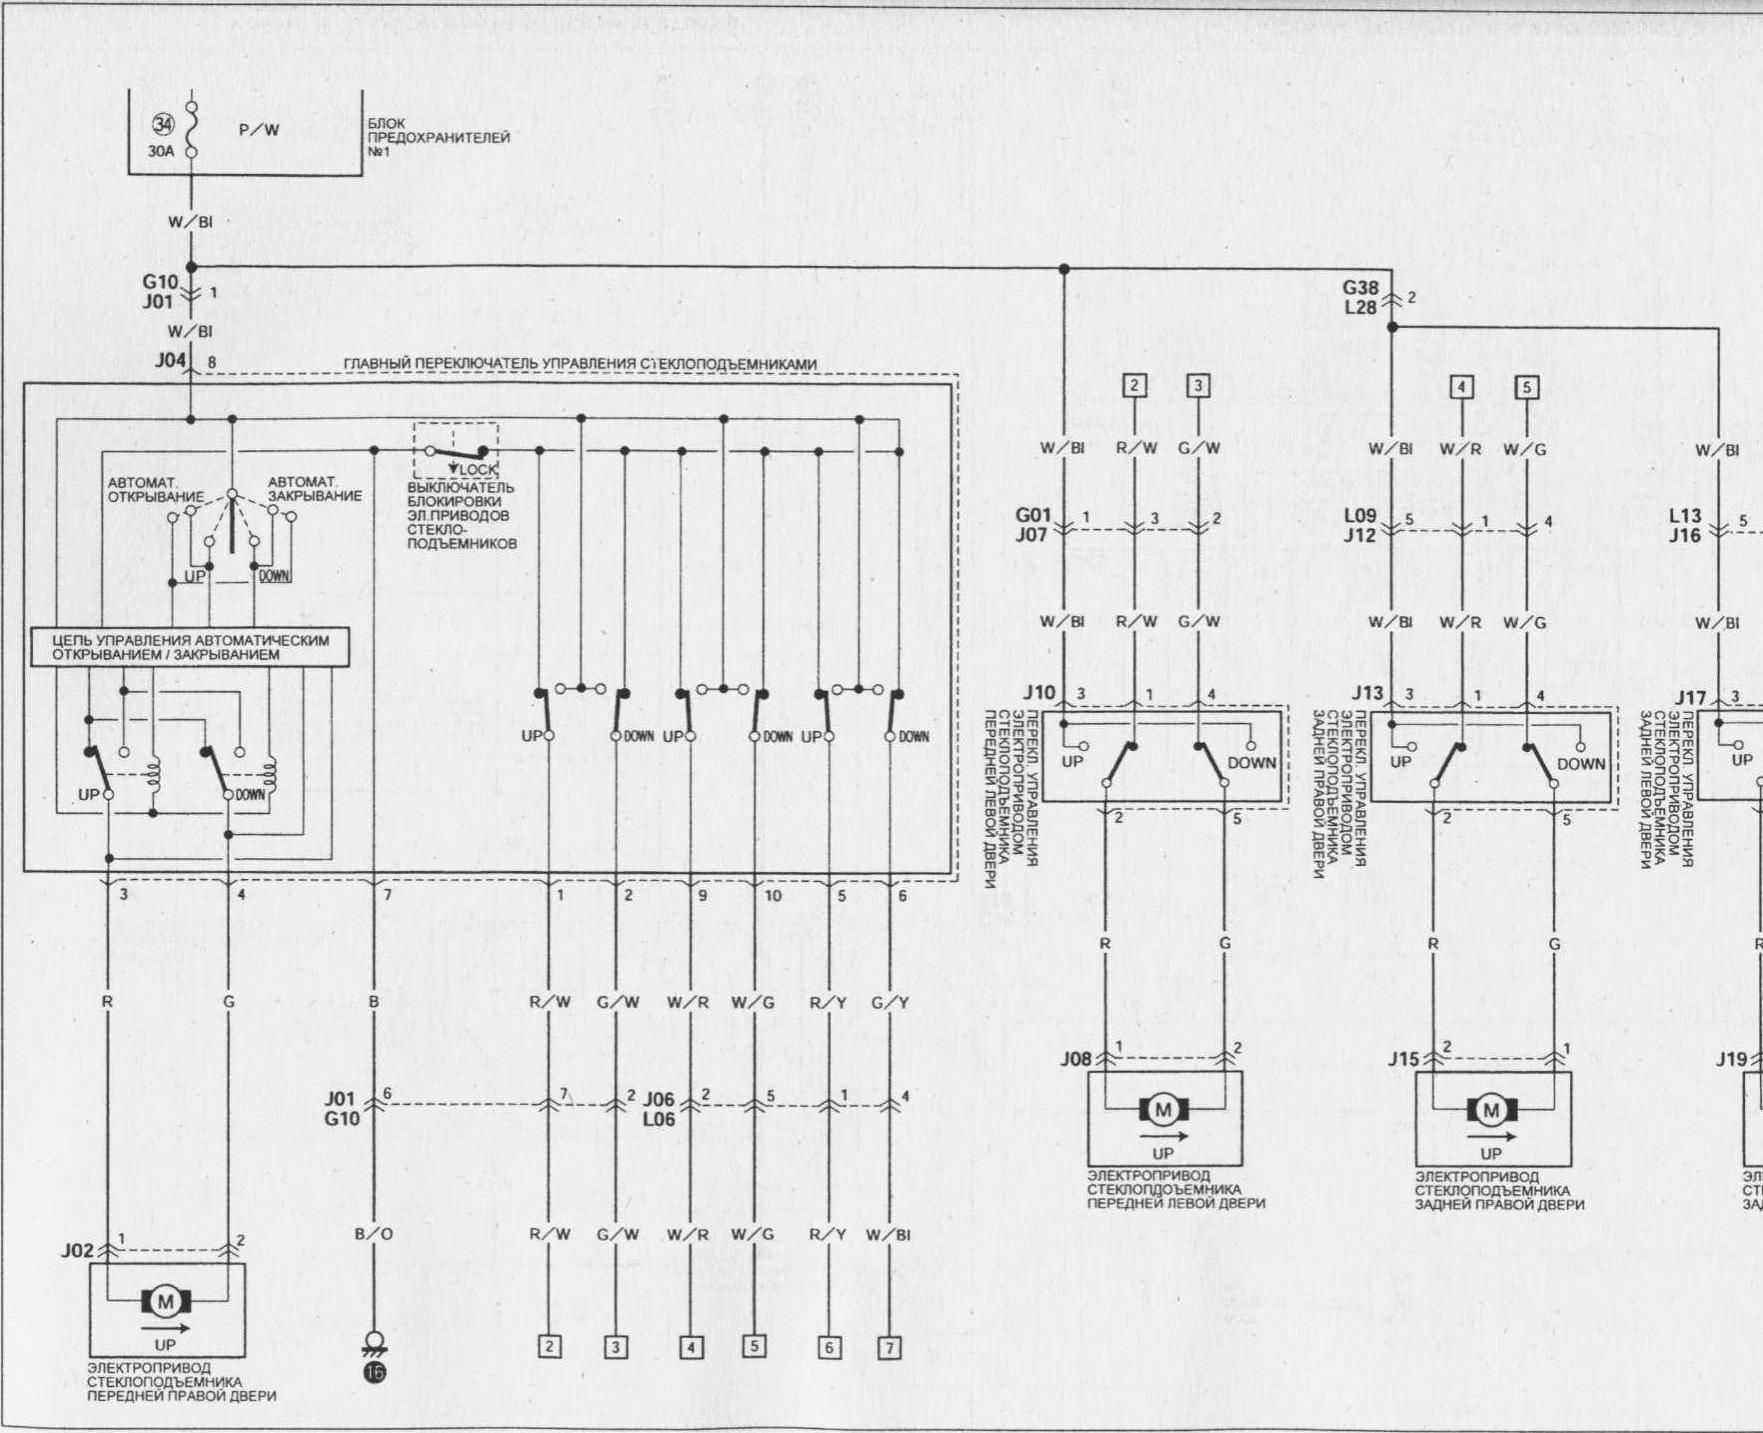 SUZUKI Swift Wiring Diagrams - Car Electrical Wiring DiagramCar Electrical Wiring Diagram - Jimdo